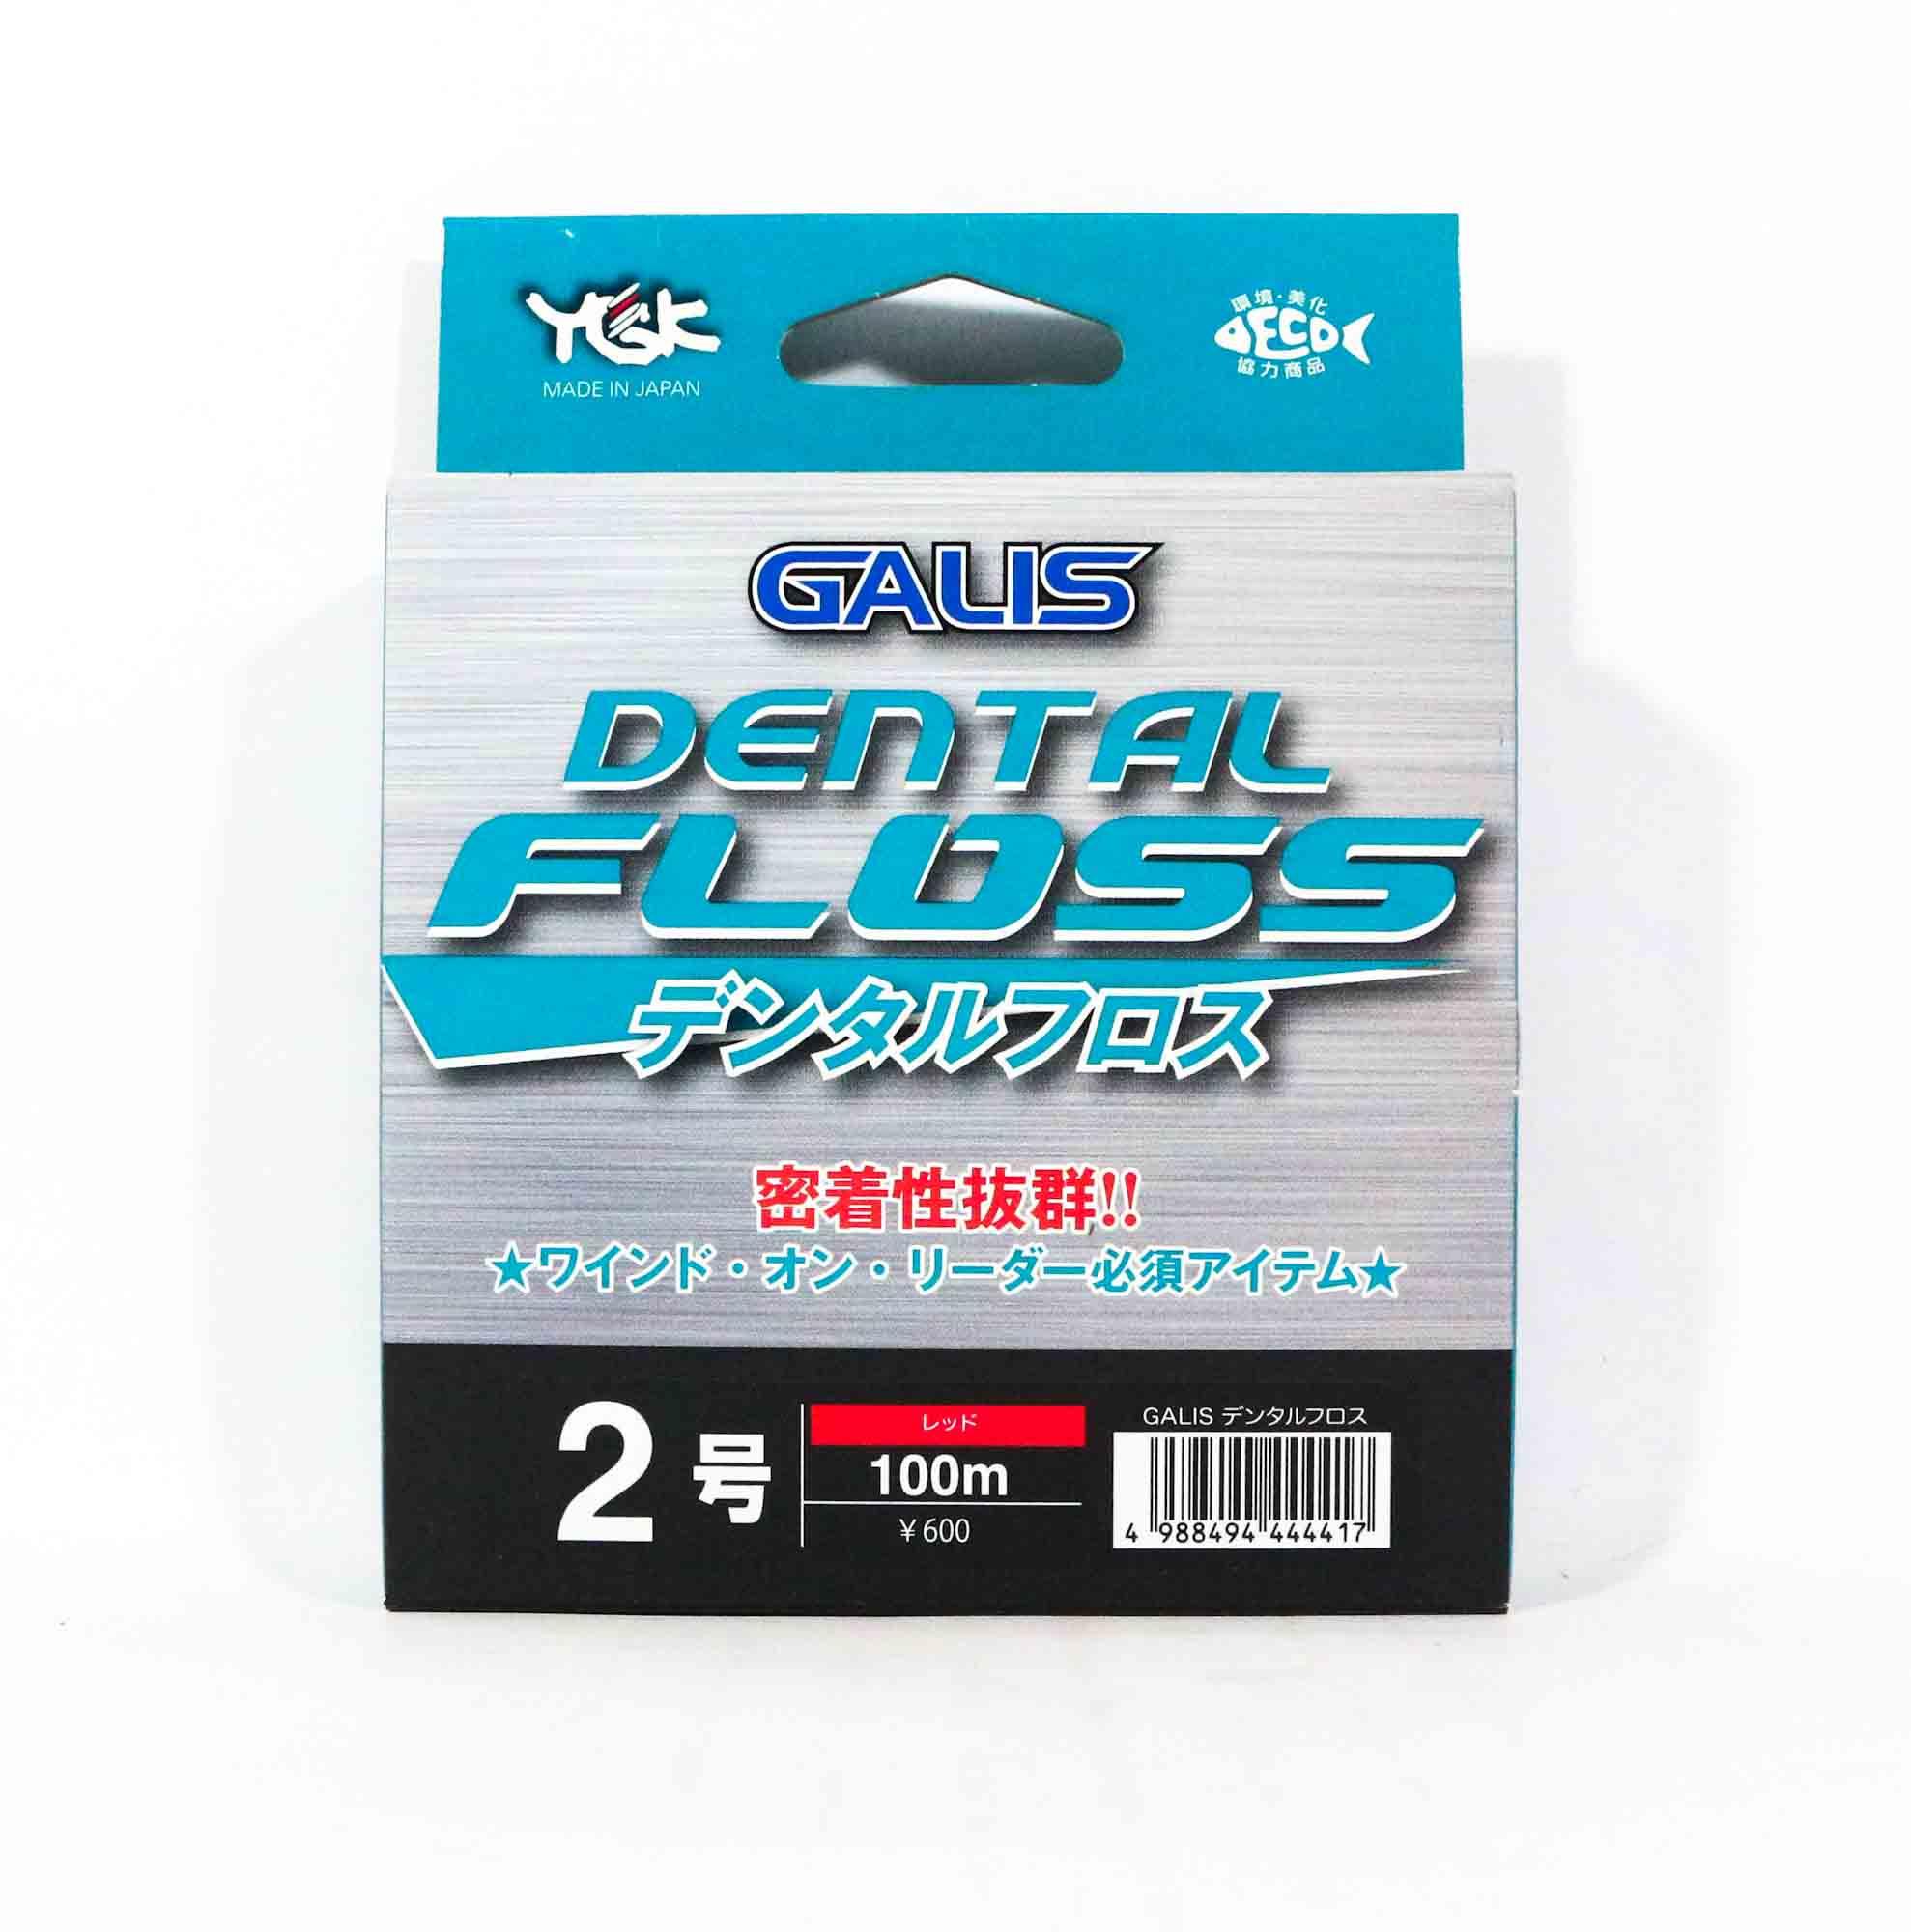 YGK Galis Dental Floss For Assist Hook 100m Size 2 Red (4417)